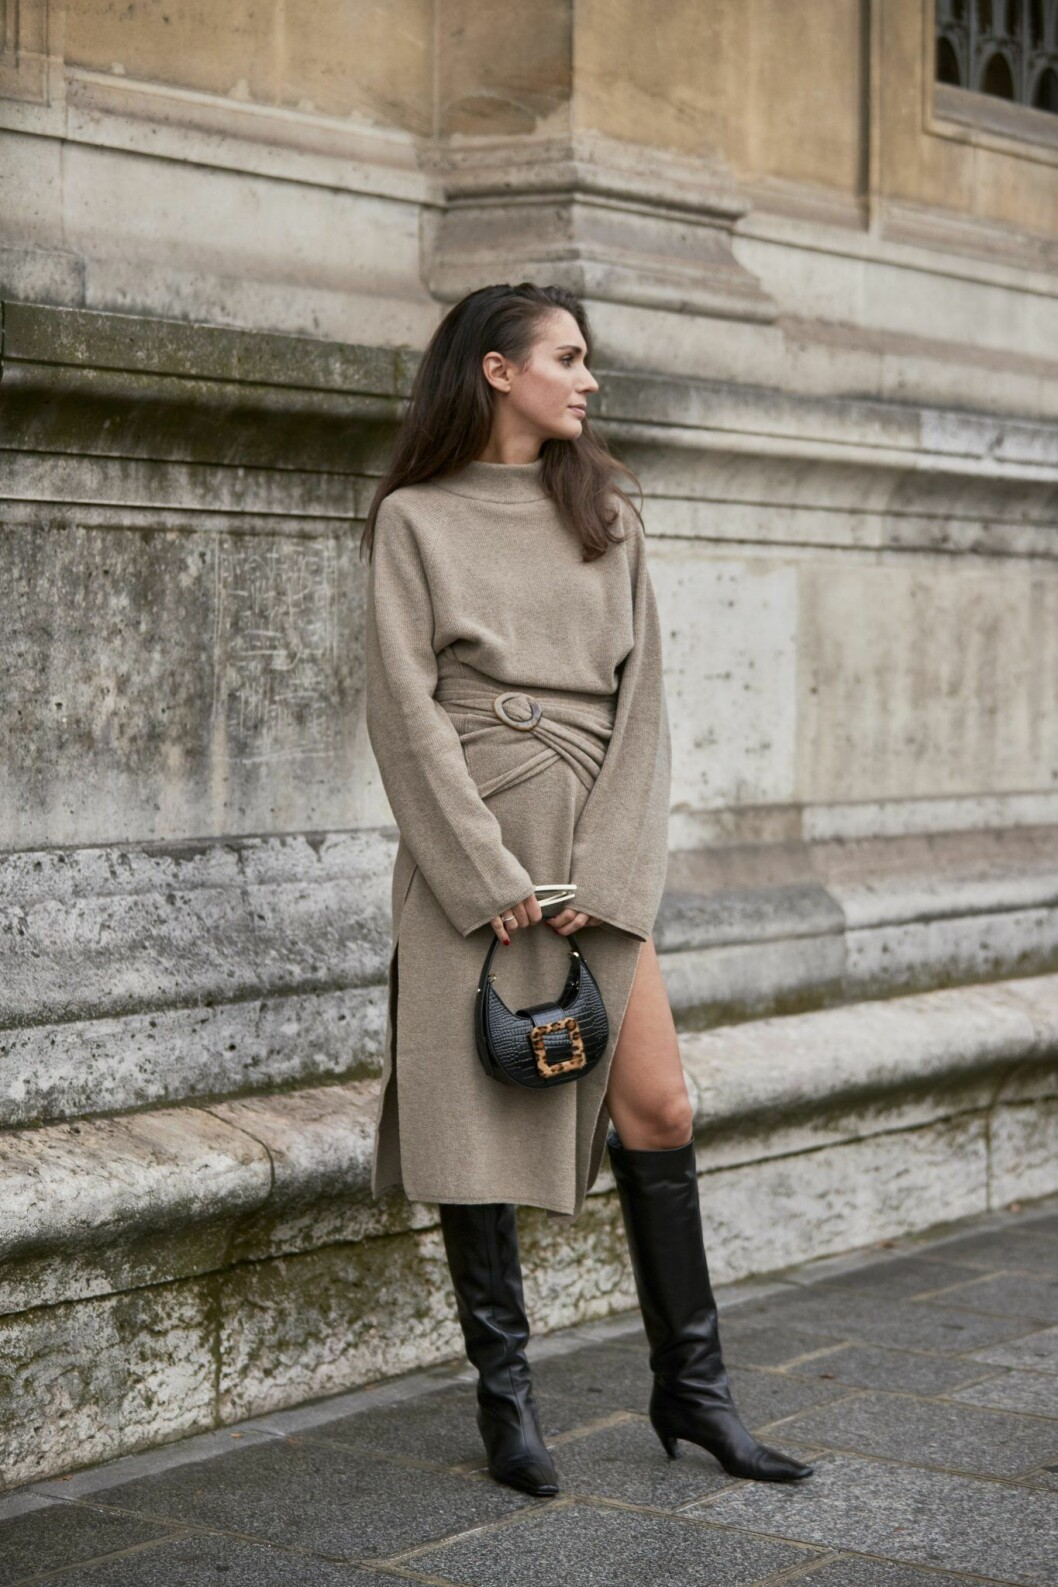 Streetstyleinspiration från modeveckan i Milano.